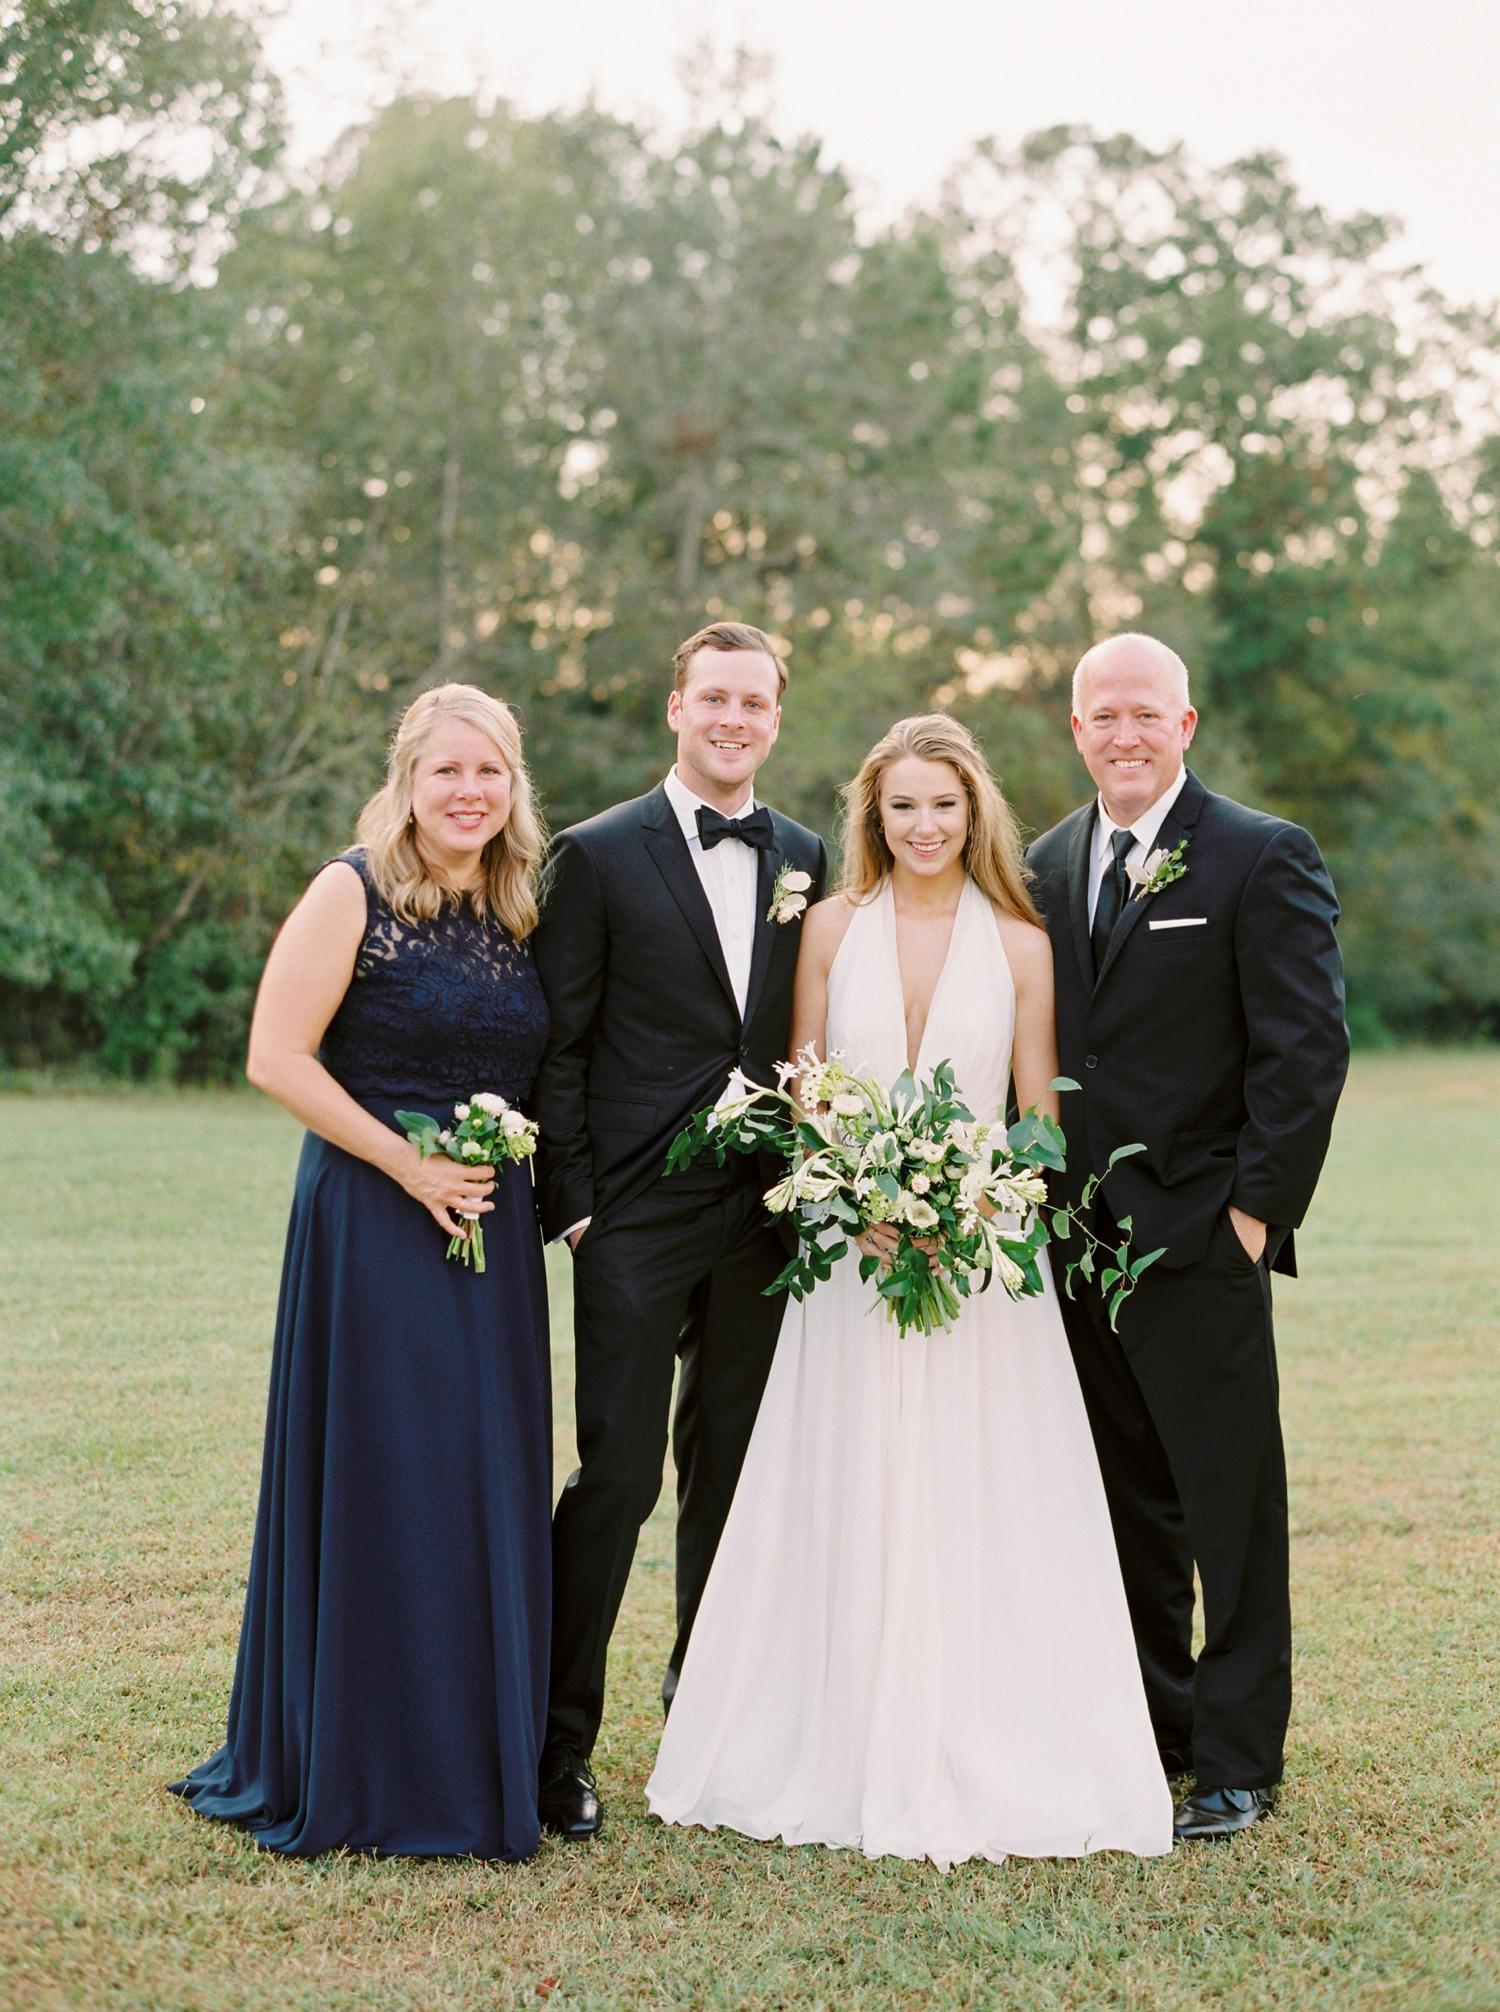 Calgary wedding photographers | georgia wedding photographers | fine art film | Justine Milton Photography | georgia wedding | family portraits | wedding party